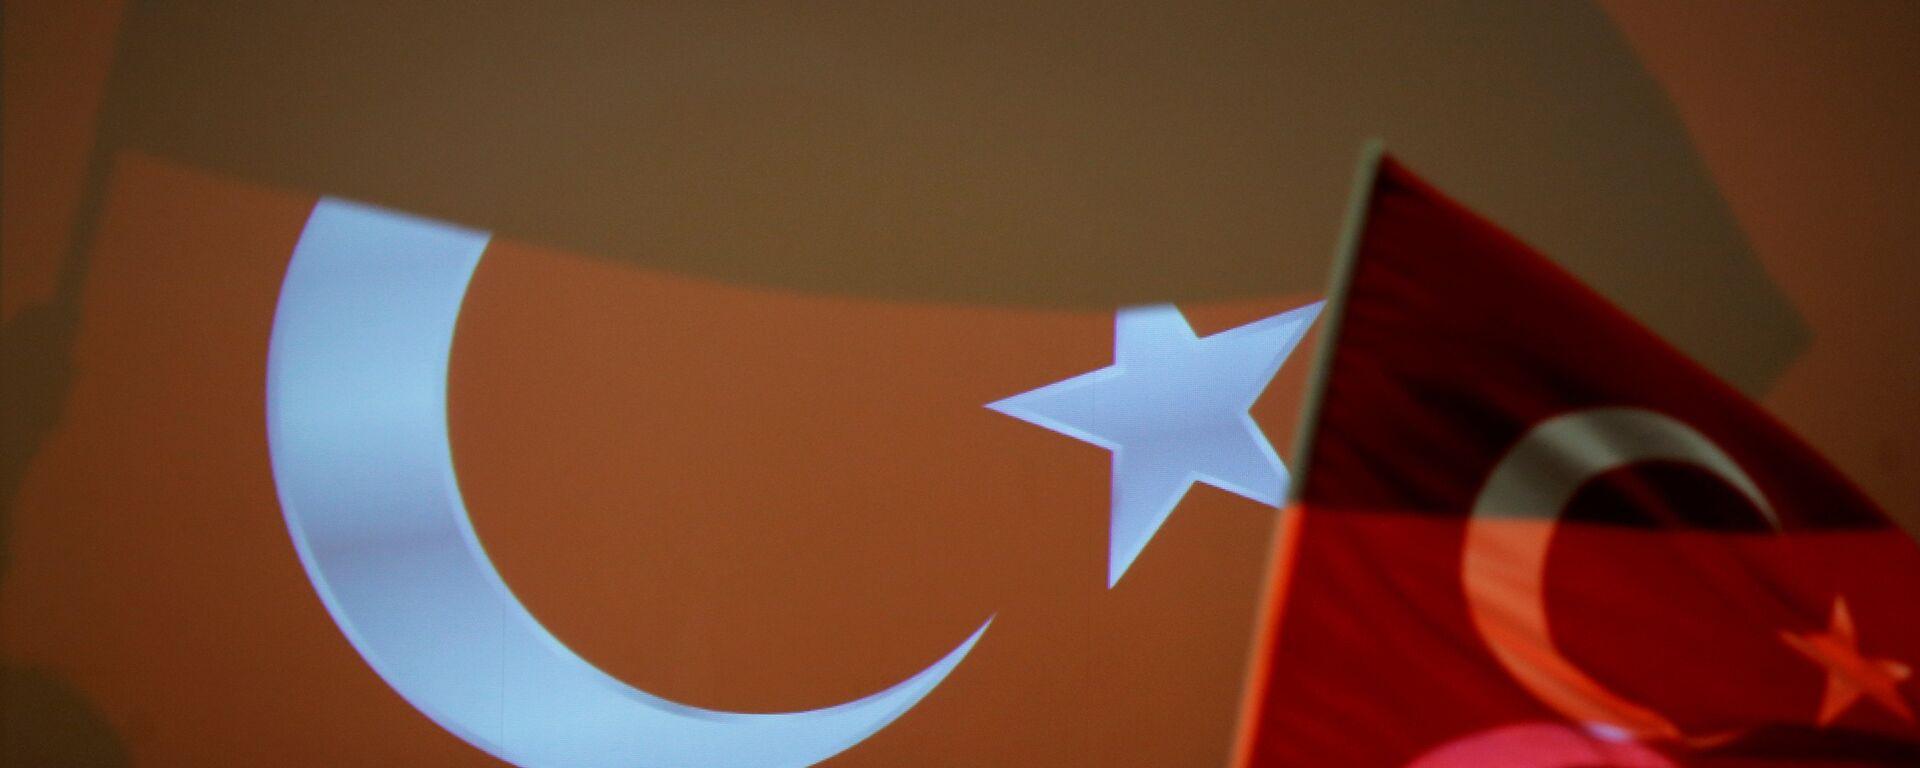 Bandera de Turquía - Sputnik Mundo, 1920, 05.10.2020